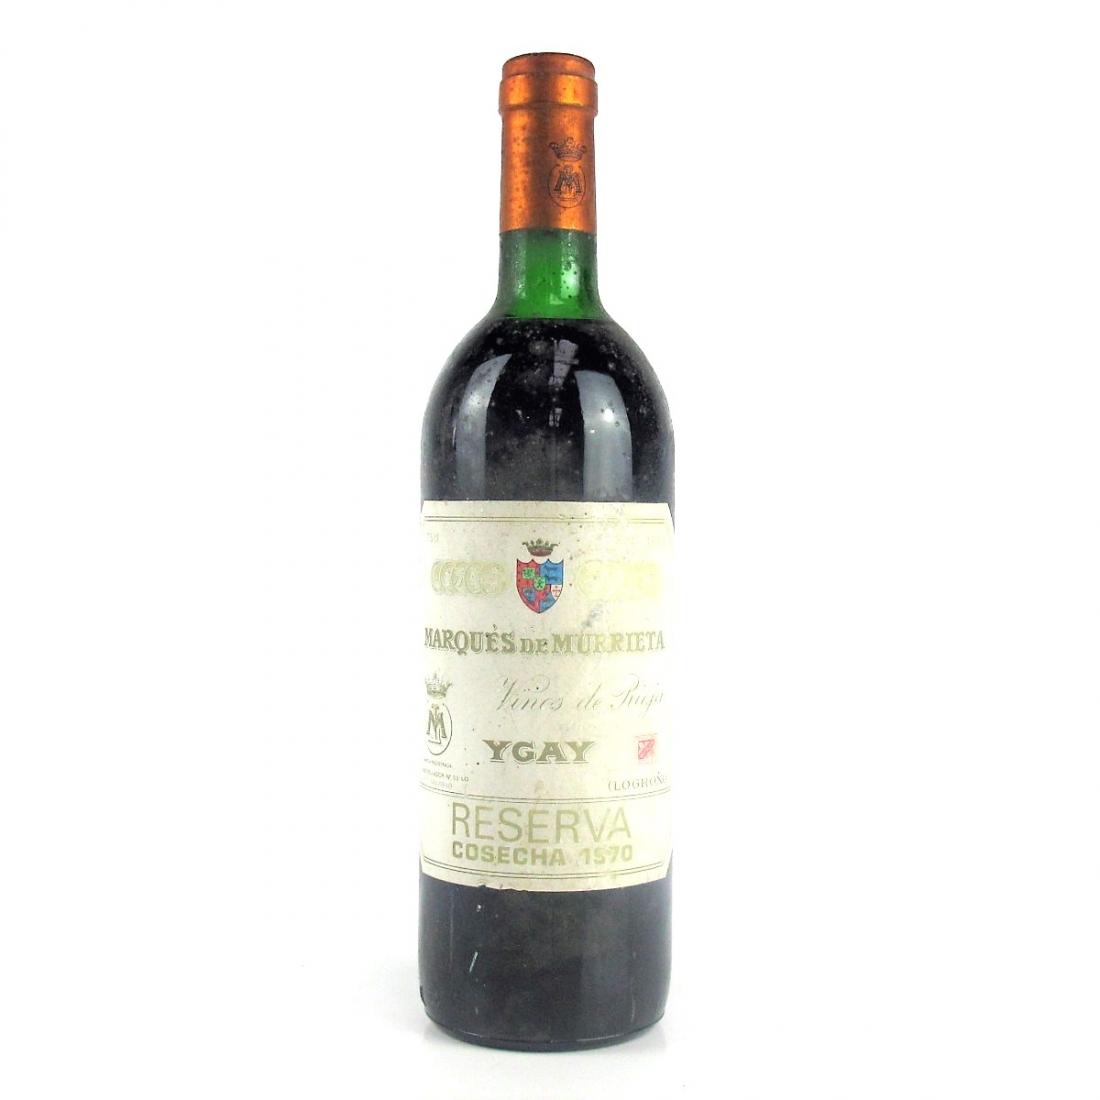 Marques De Murrieta 1970 Rioja Reserva